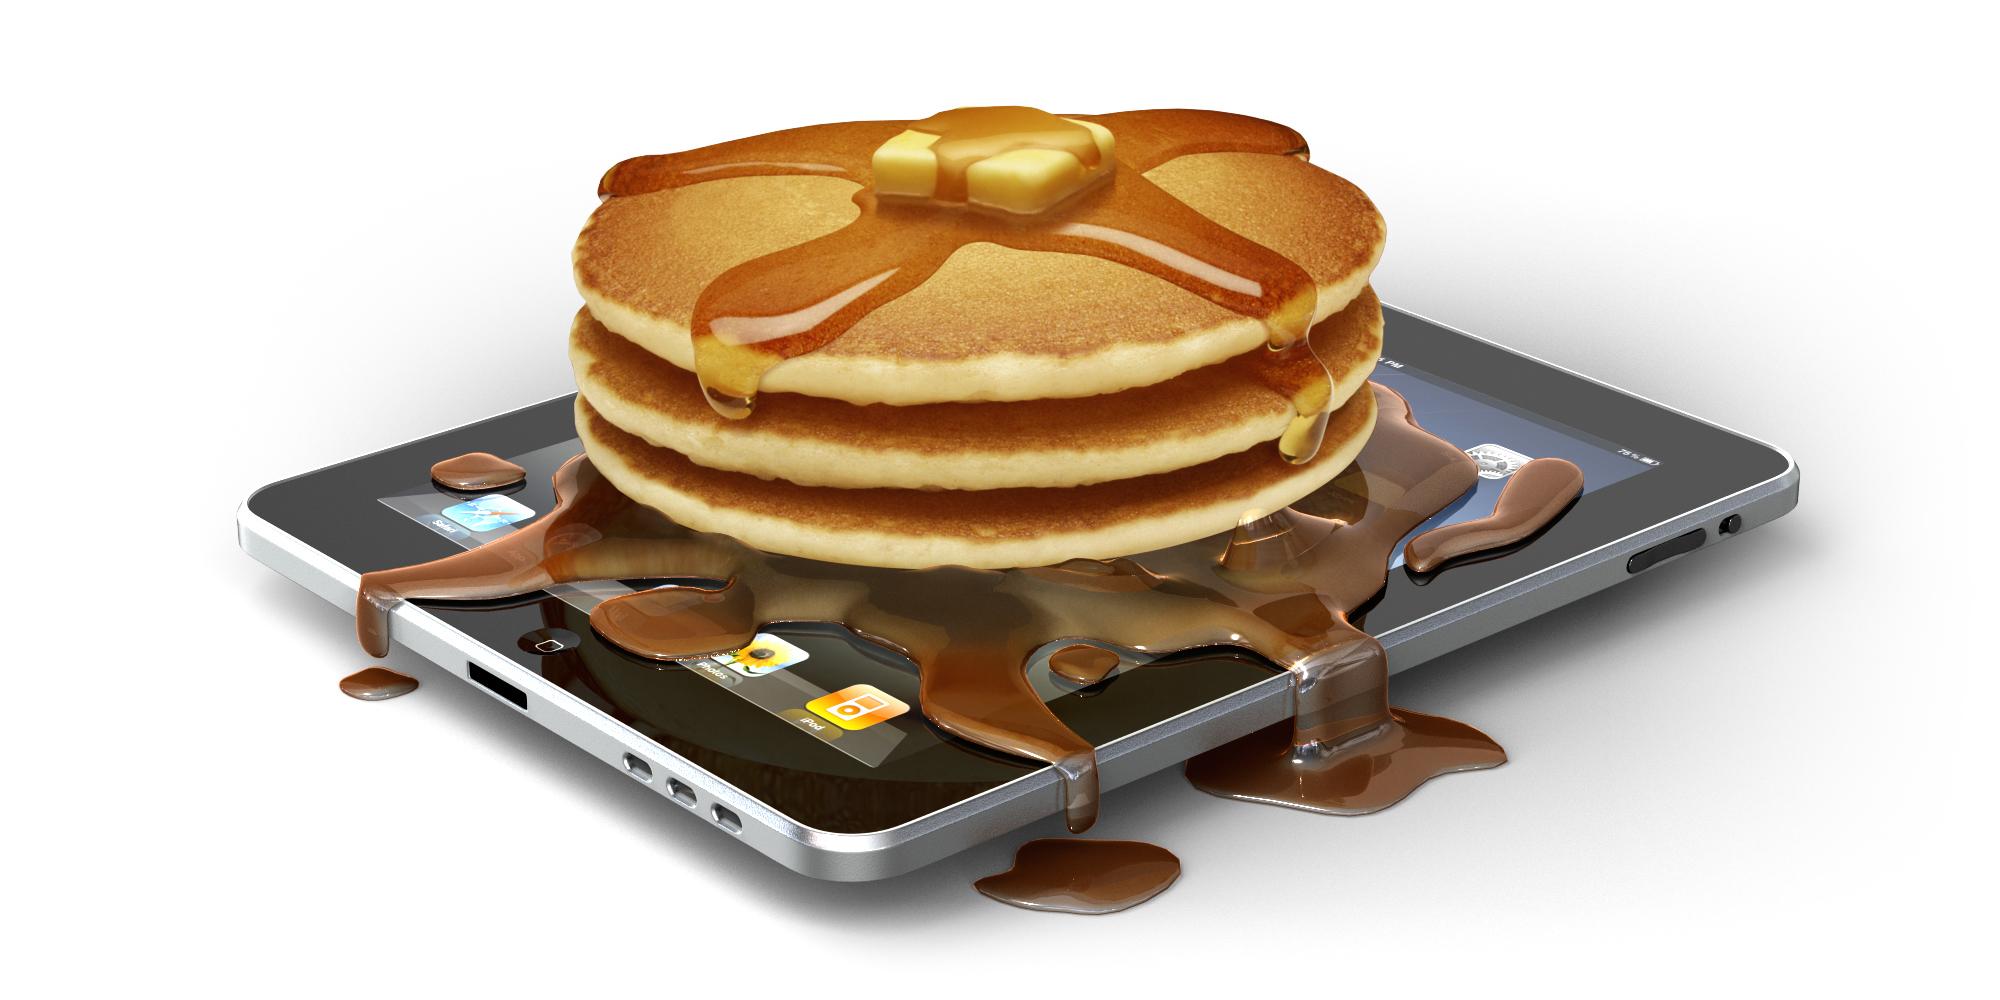 ipad_hotcakes_5.jpg